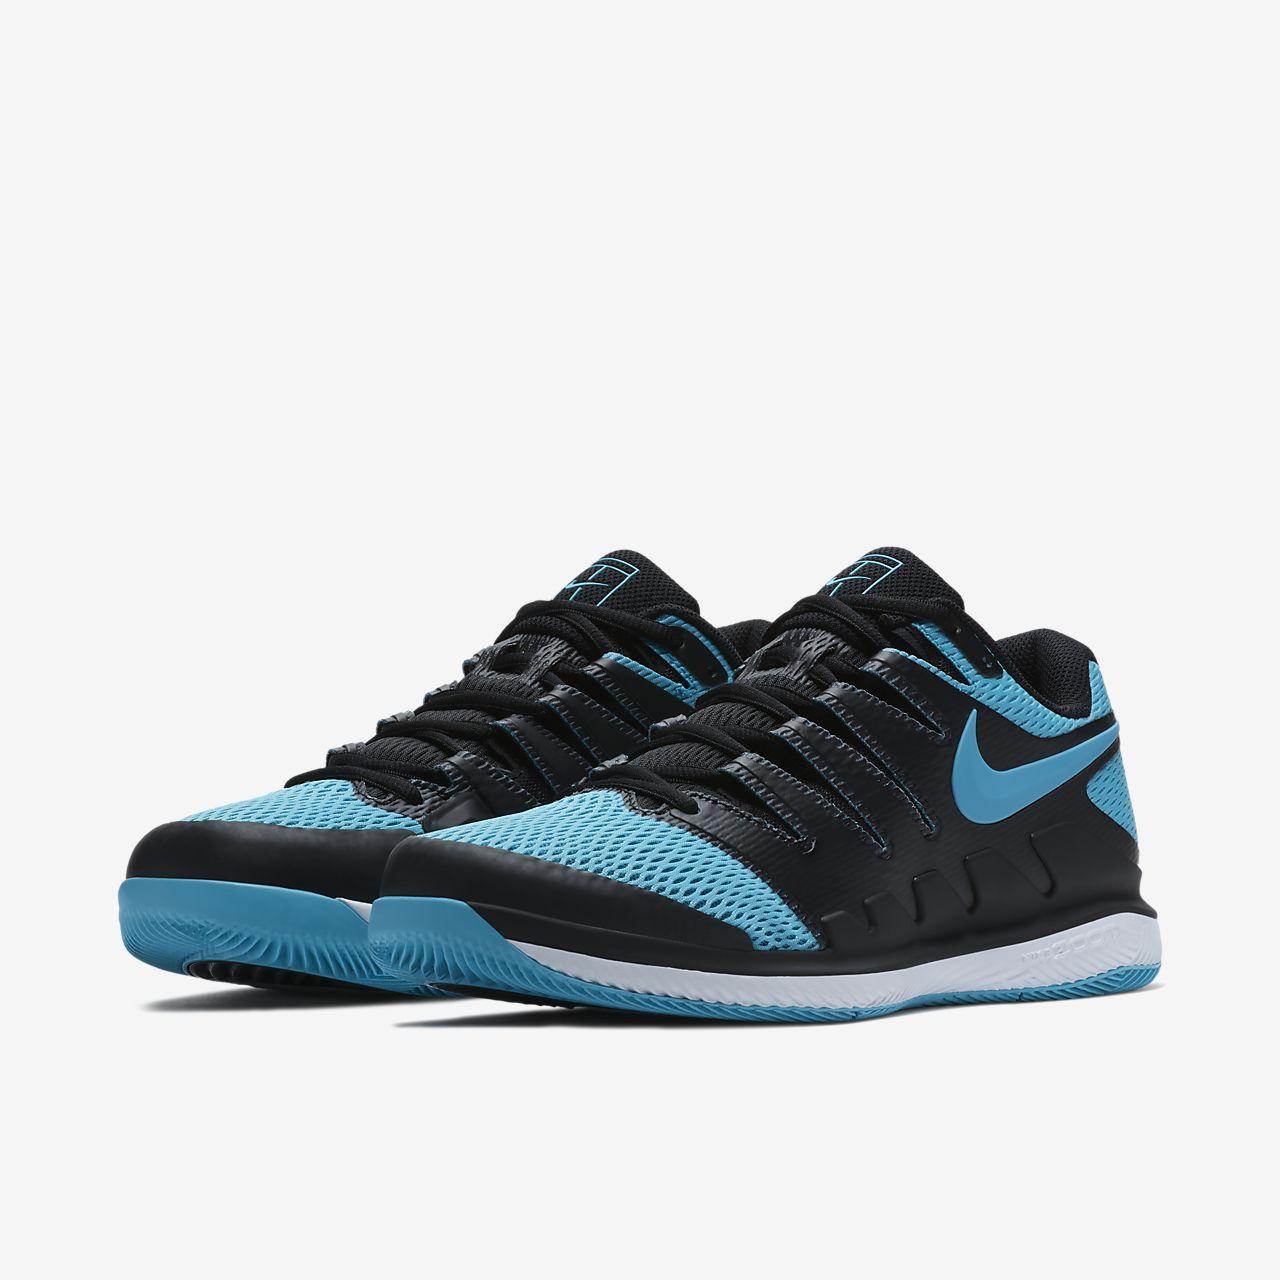 ... Nike Air Zoom Vapor X HC Men's Tennis Shoe